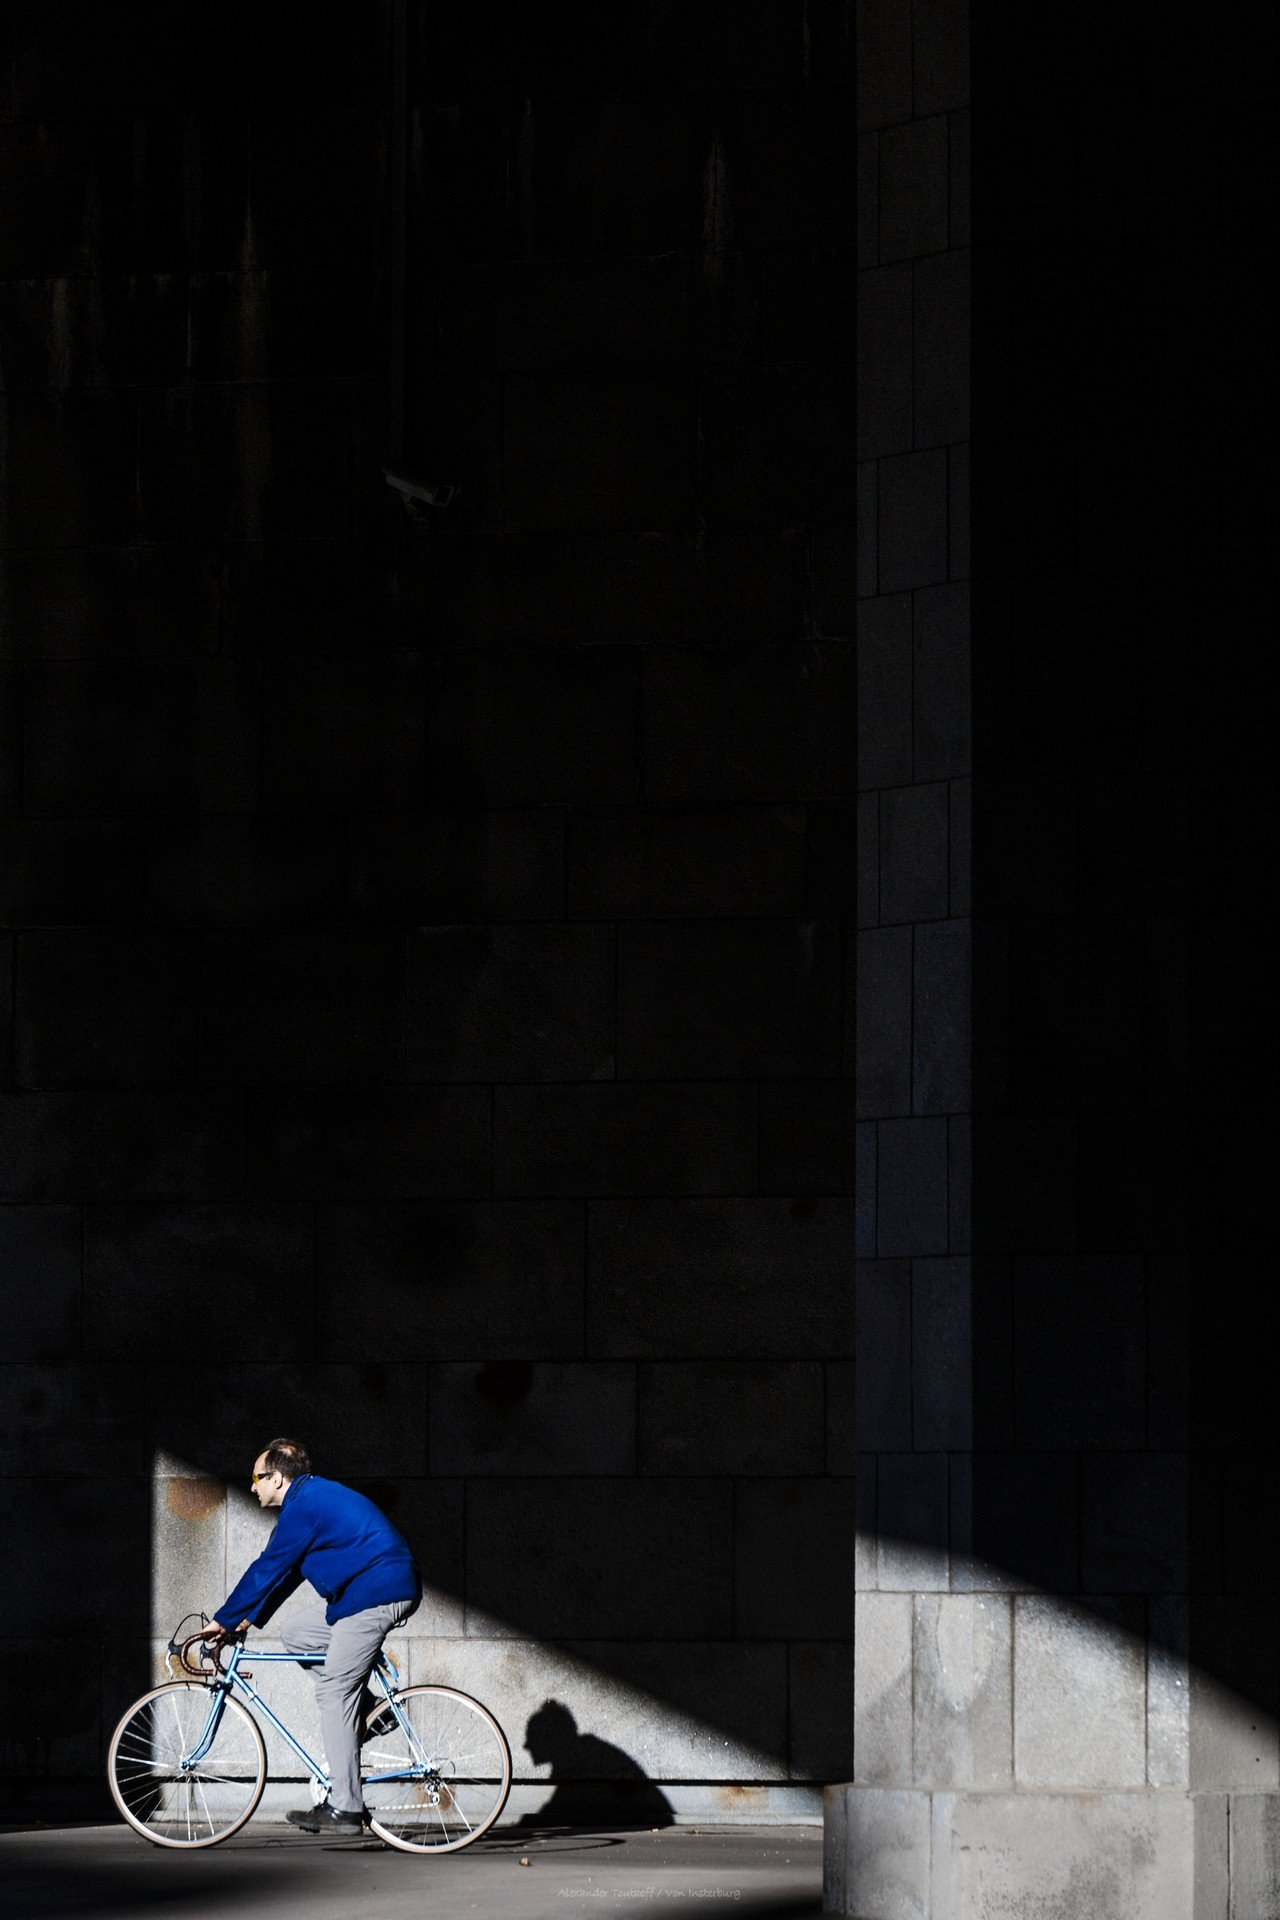 Люди, город, улица, жанр, свет, тени, вечер, велосипед, велосипедист, цвет, синий, минимализм, , АлександрТутаев